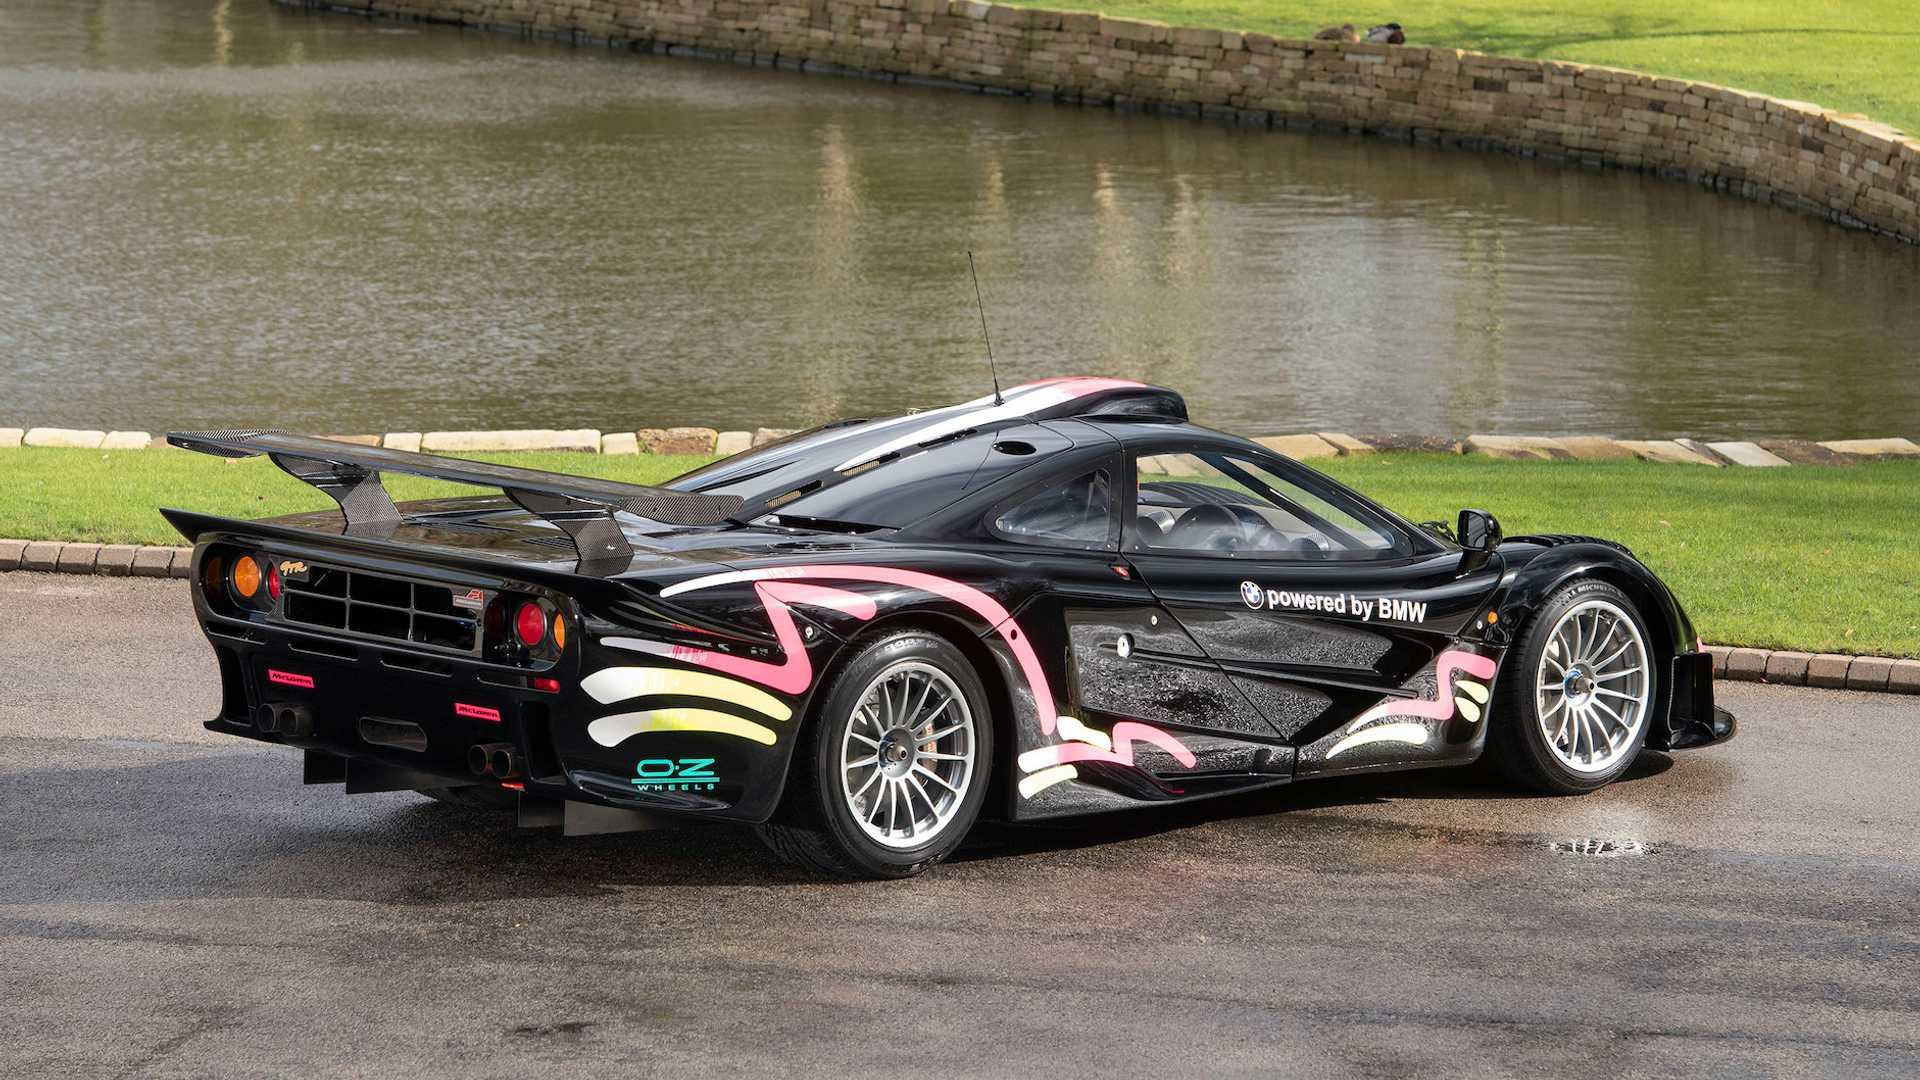 McLaren F1 GTR Longtail Price